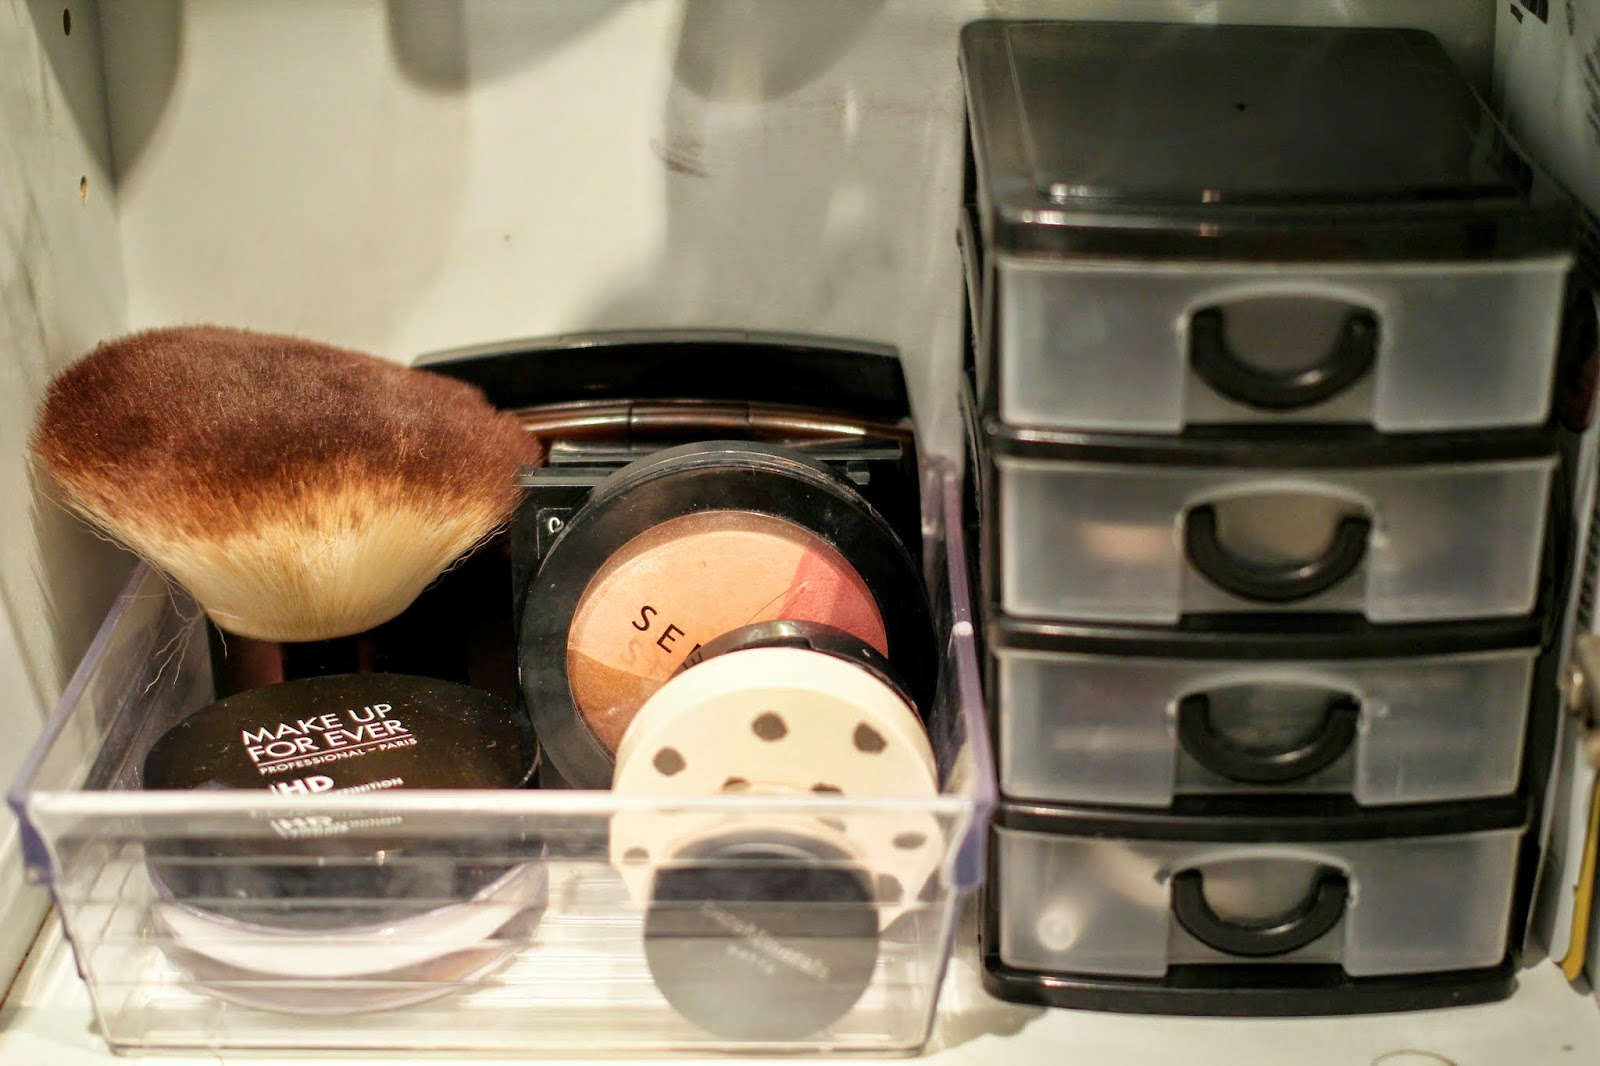 makeup organisation, blush collection, makeup storage, tips and tricks